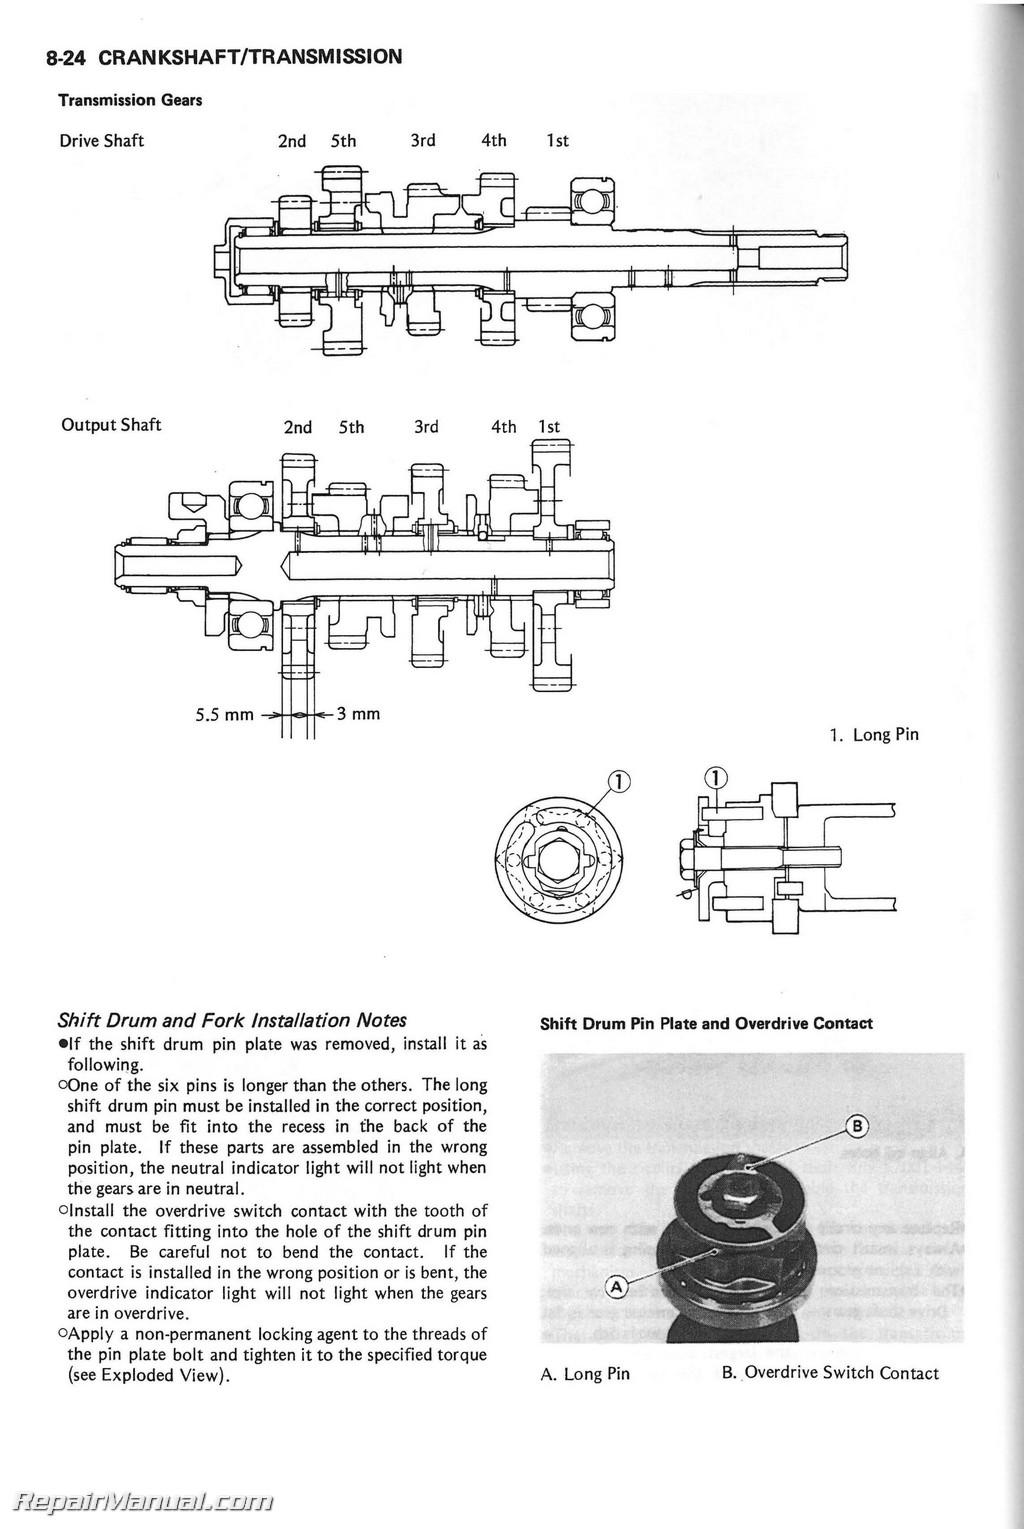 CARBURETOR GASKETS JETS REBUILD KIT KAWASAKI ZG1200 ZG 1200 VOYAGER XII 86-2003